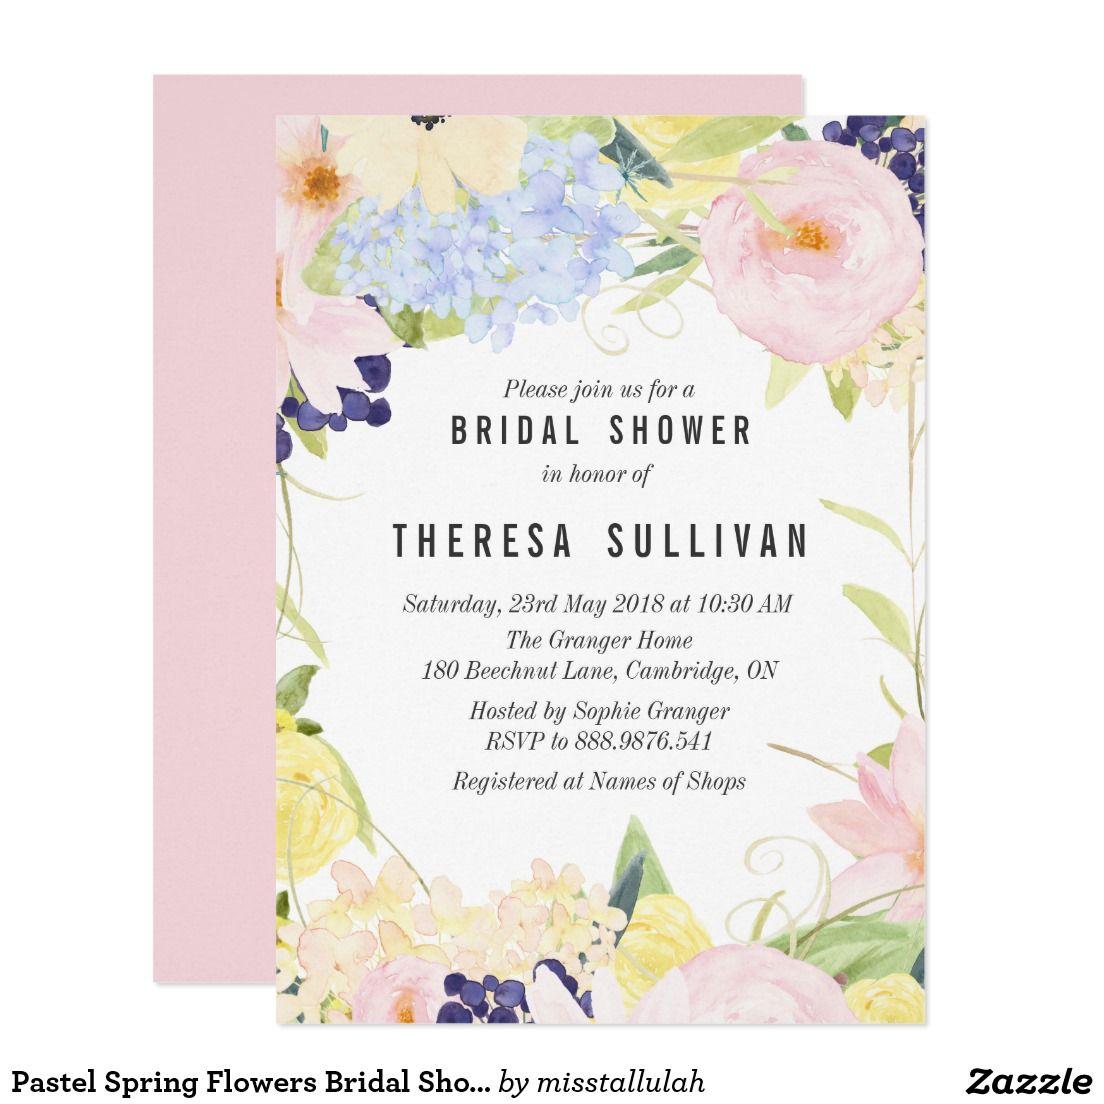 Pastel Spring Flowers Bridal Shower Invitation | Shower invitations ...